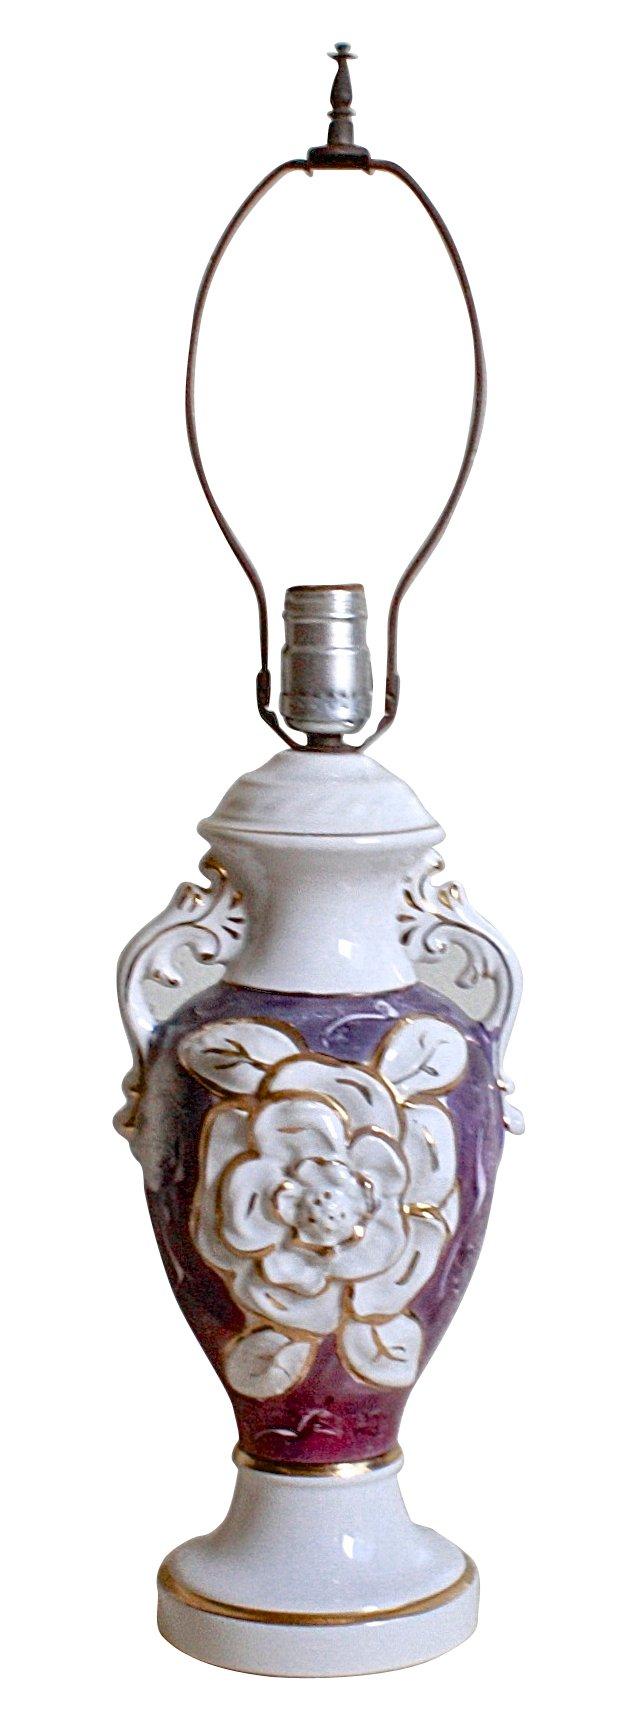 1940s Urn Porcelain Table Lamp